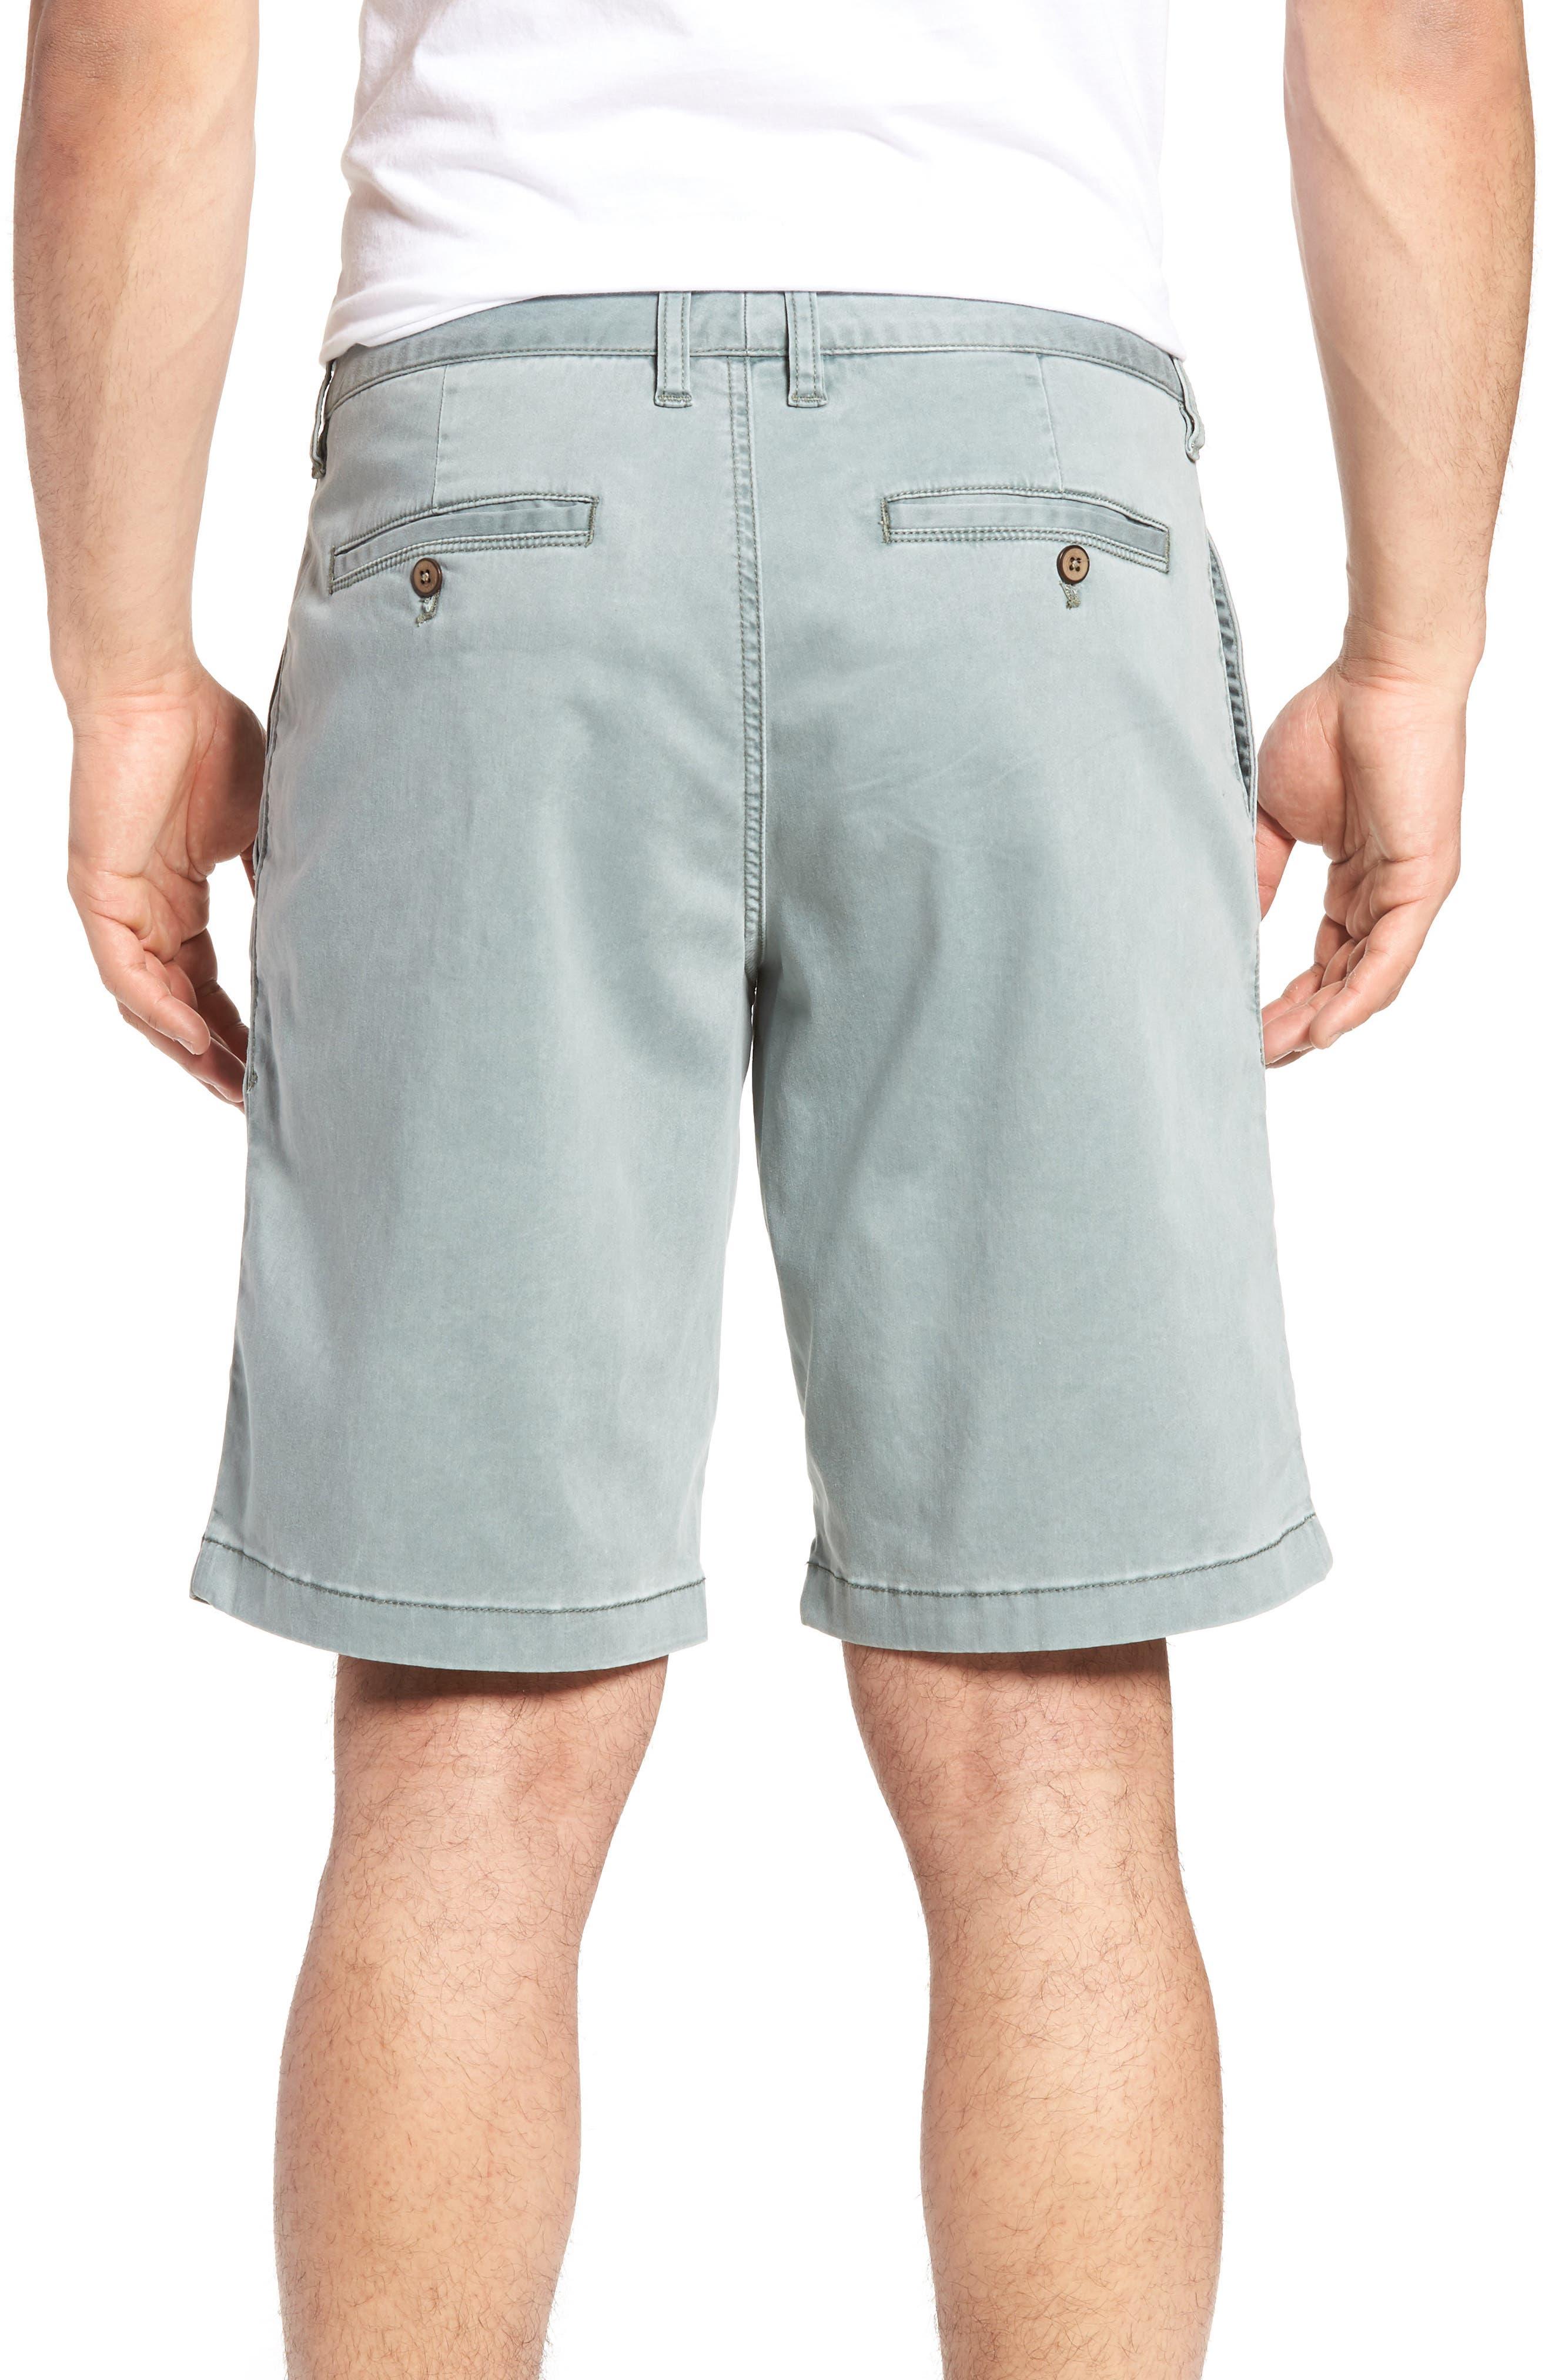 Boracay Chino Shorts,                             Alternate thumbnail 16, color,